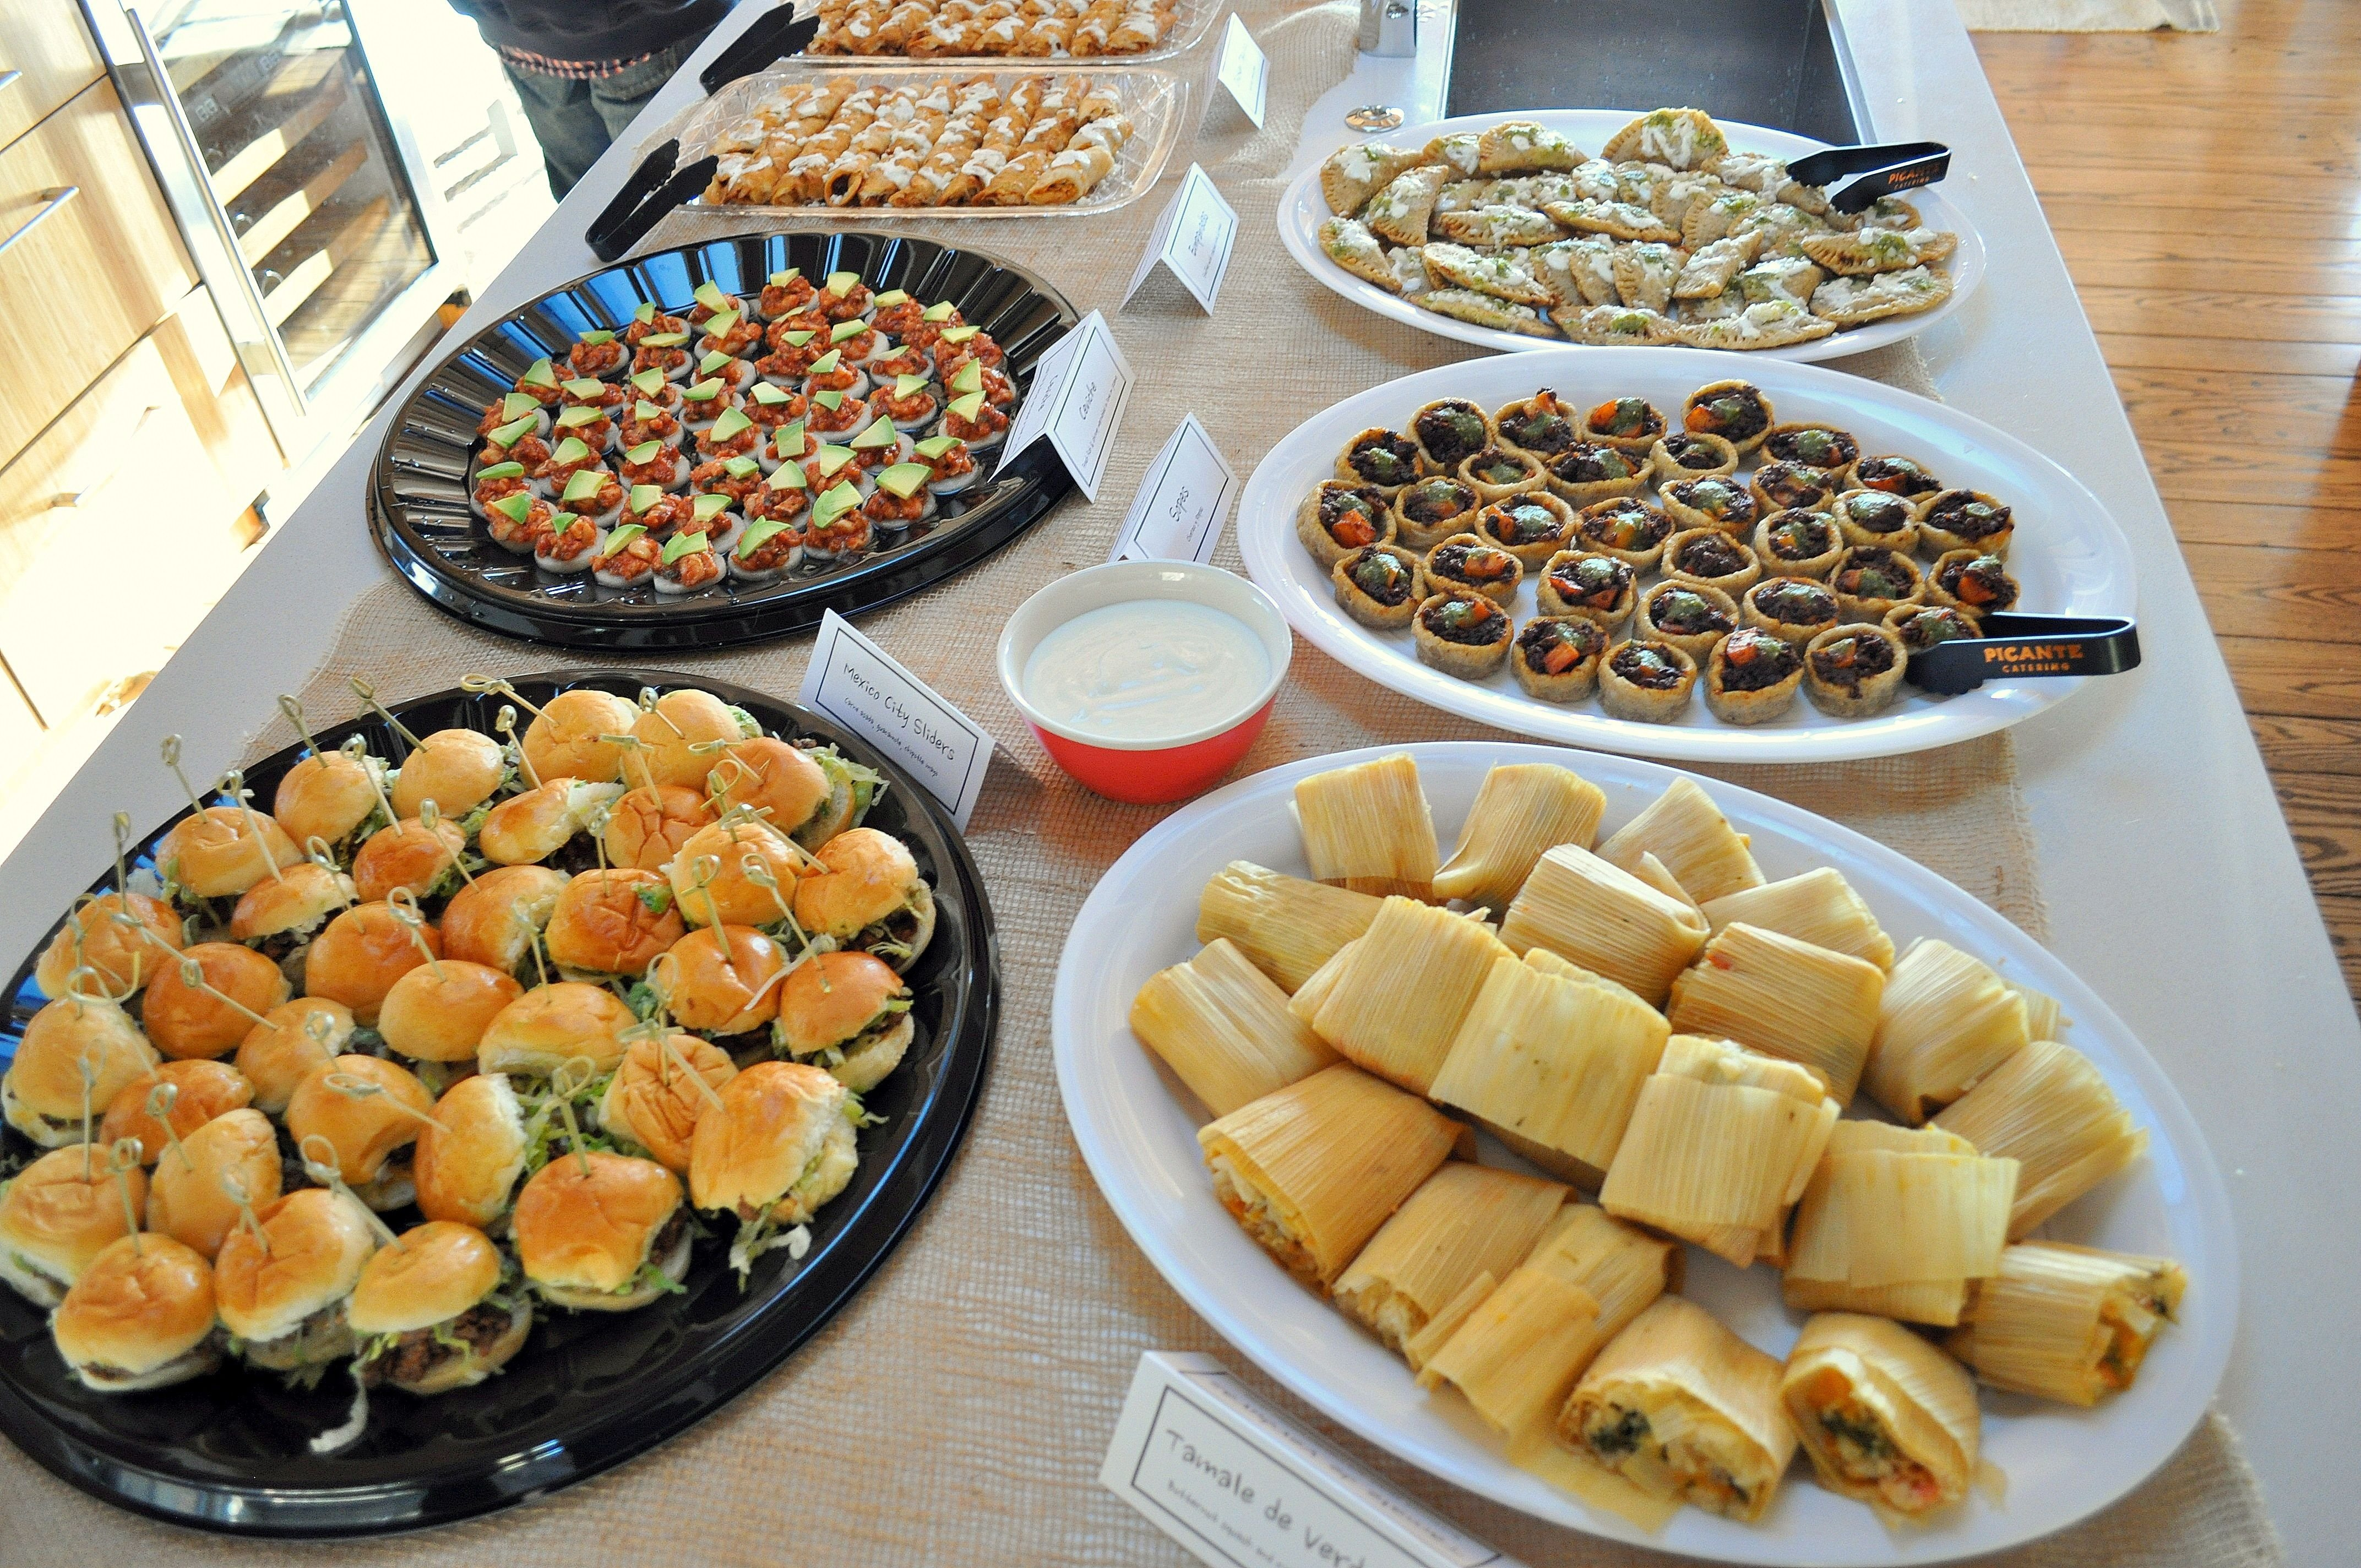 10 Attractive Unique Baby Shower Food Ideas pinrosie on baby shower food ideas pinterest baby shower foods 1 2021